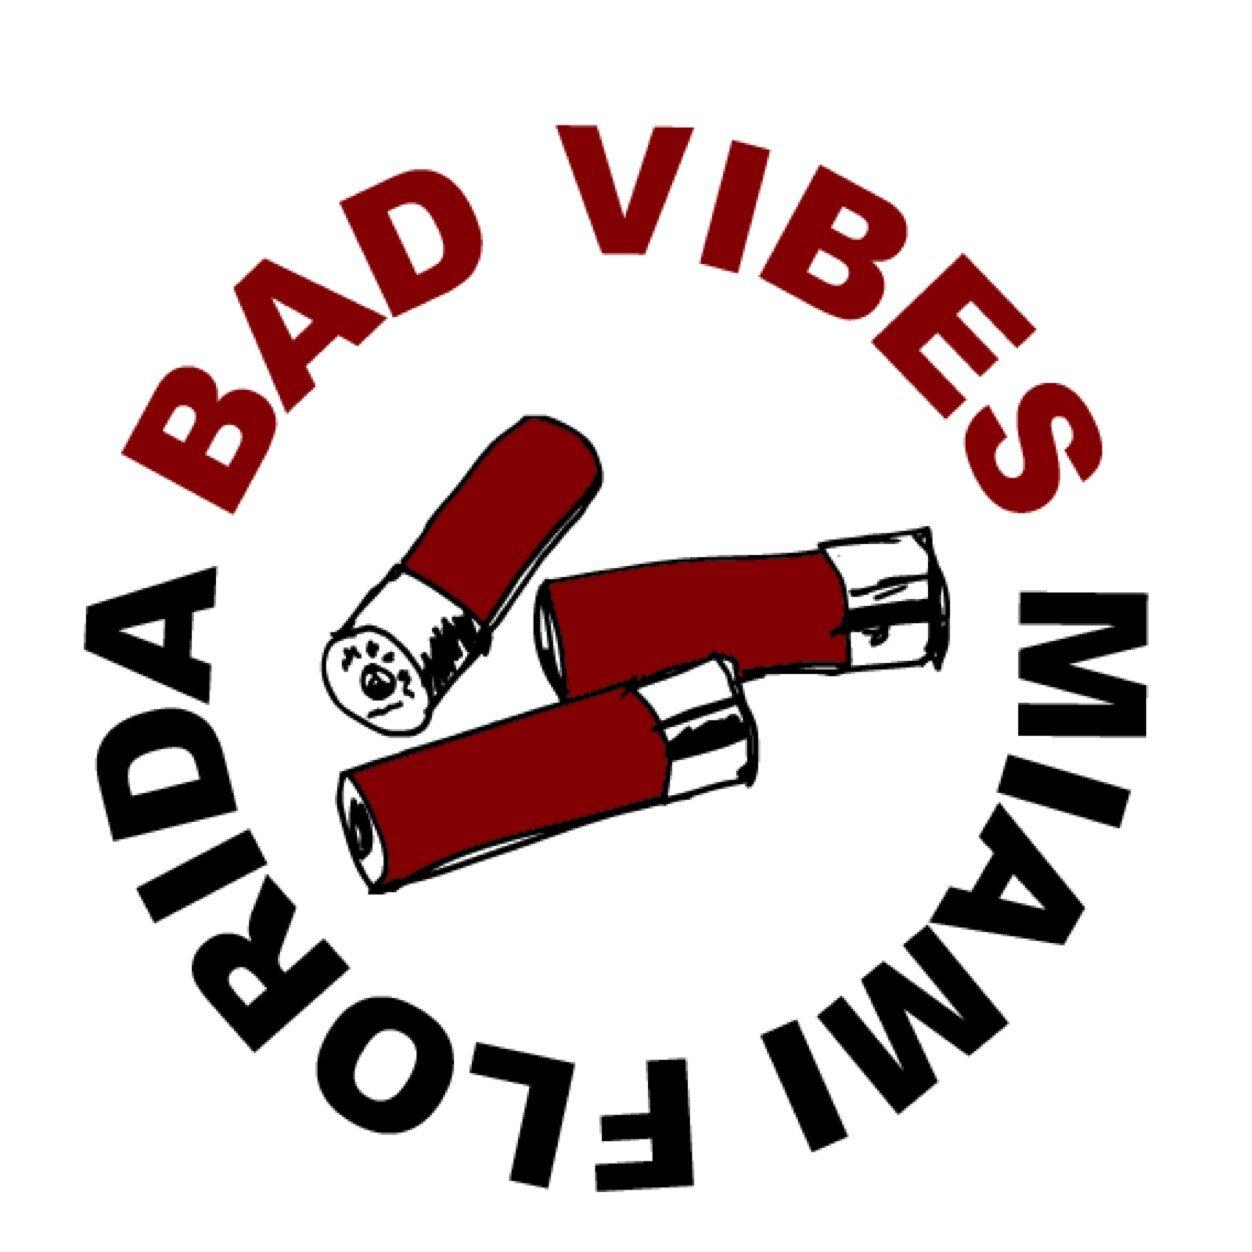 Bad Vibes Apparel Badvibesapparel Twitter